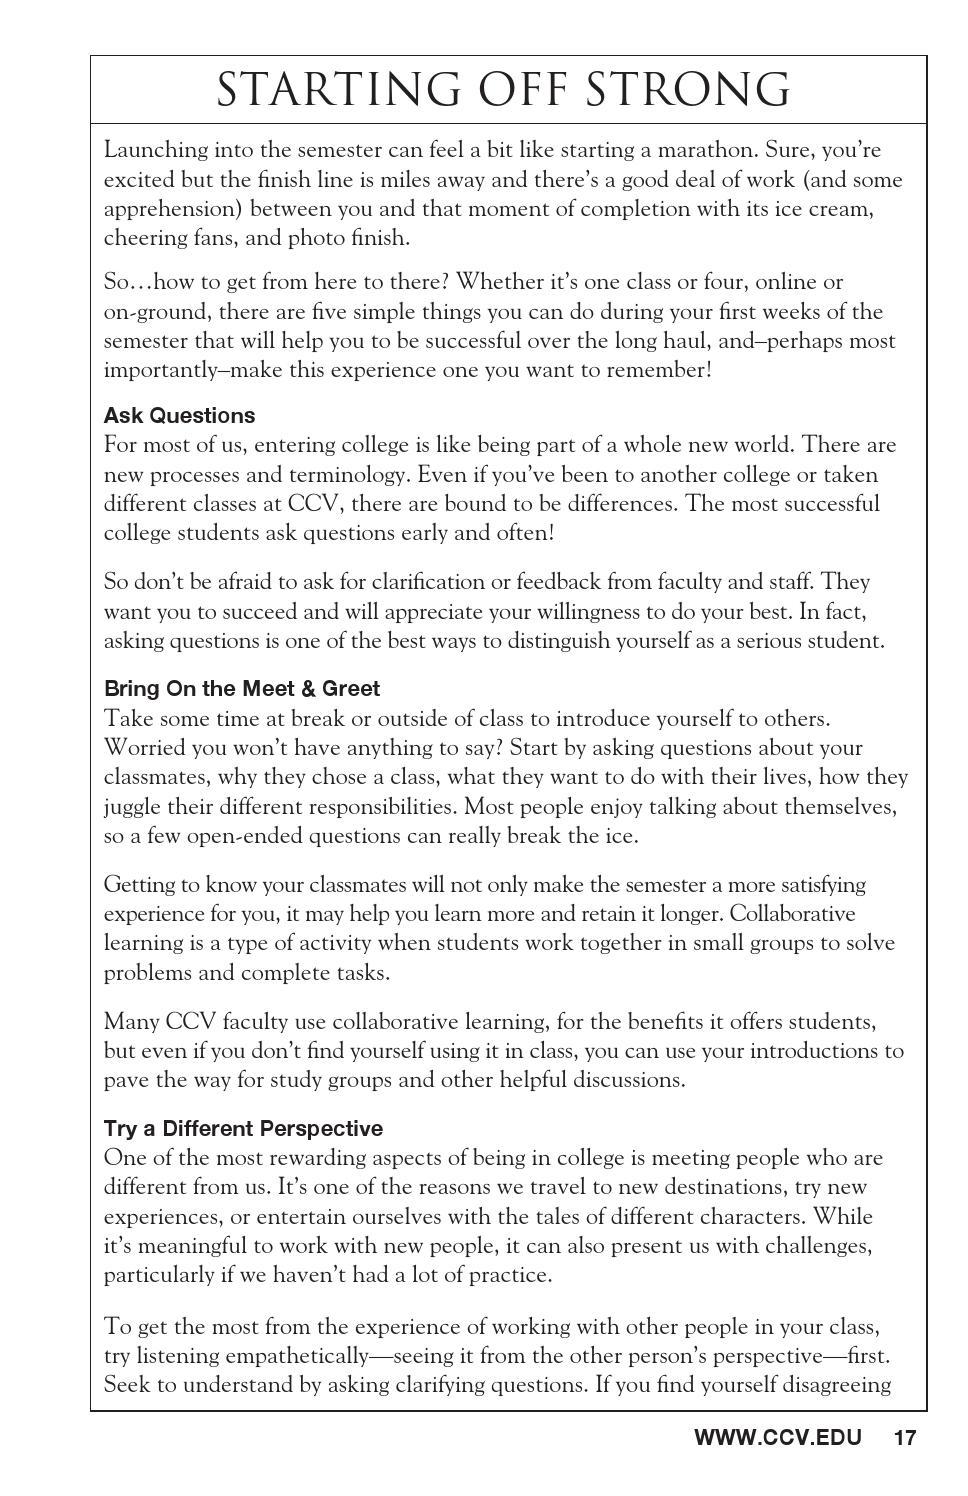 CCV Student Handbook 13-14 by Community College of Vermont